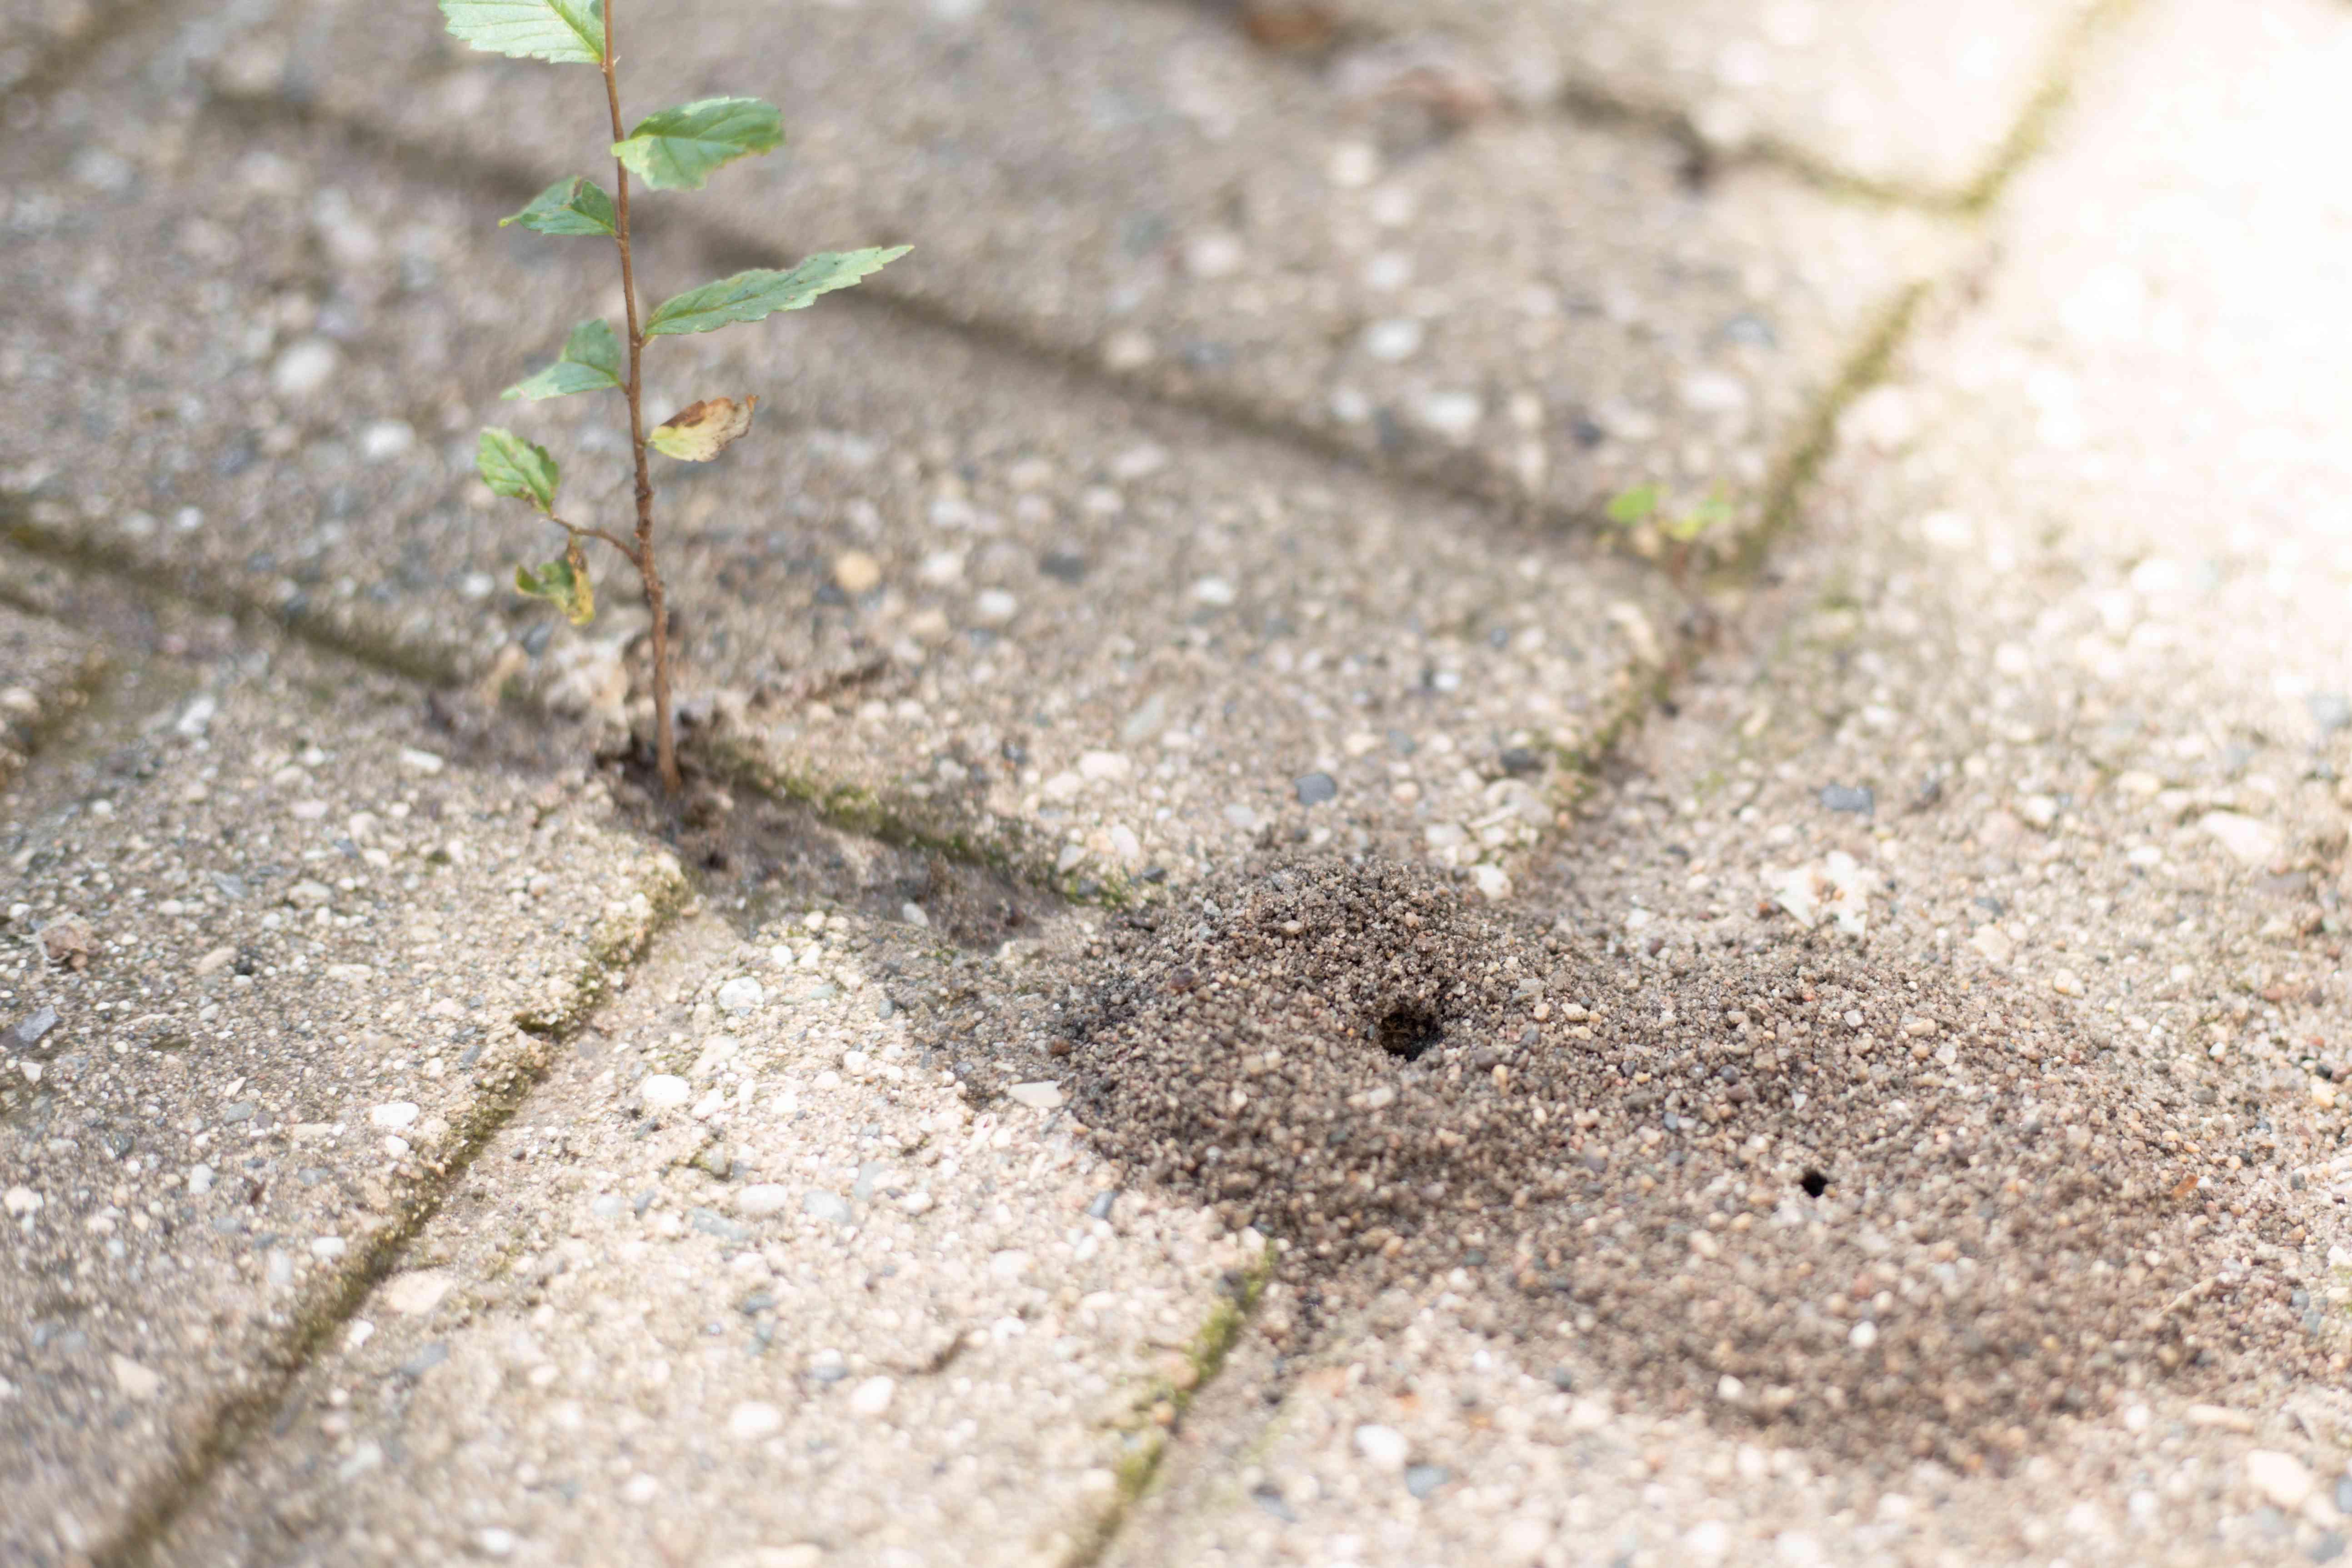 Ant nest hole in between cement block cracks